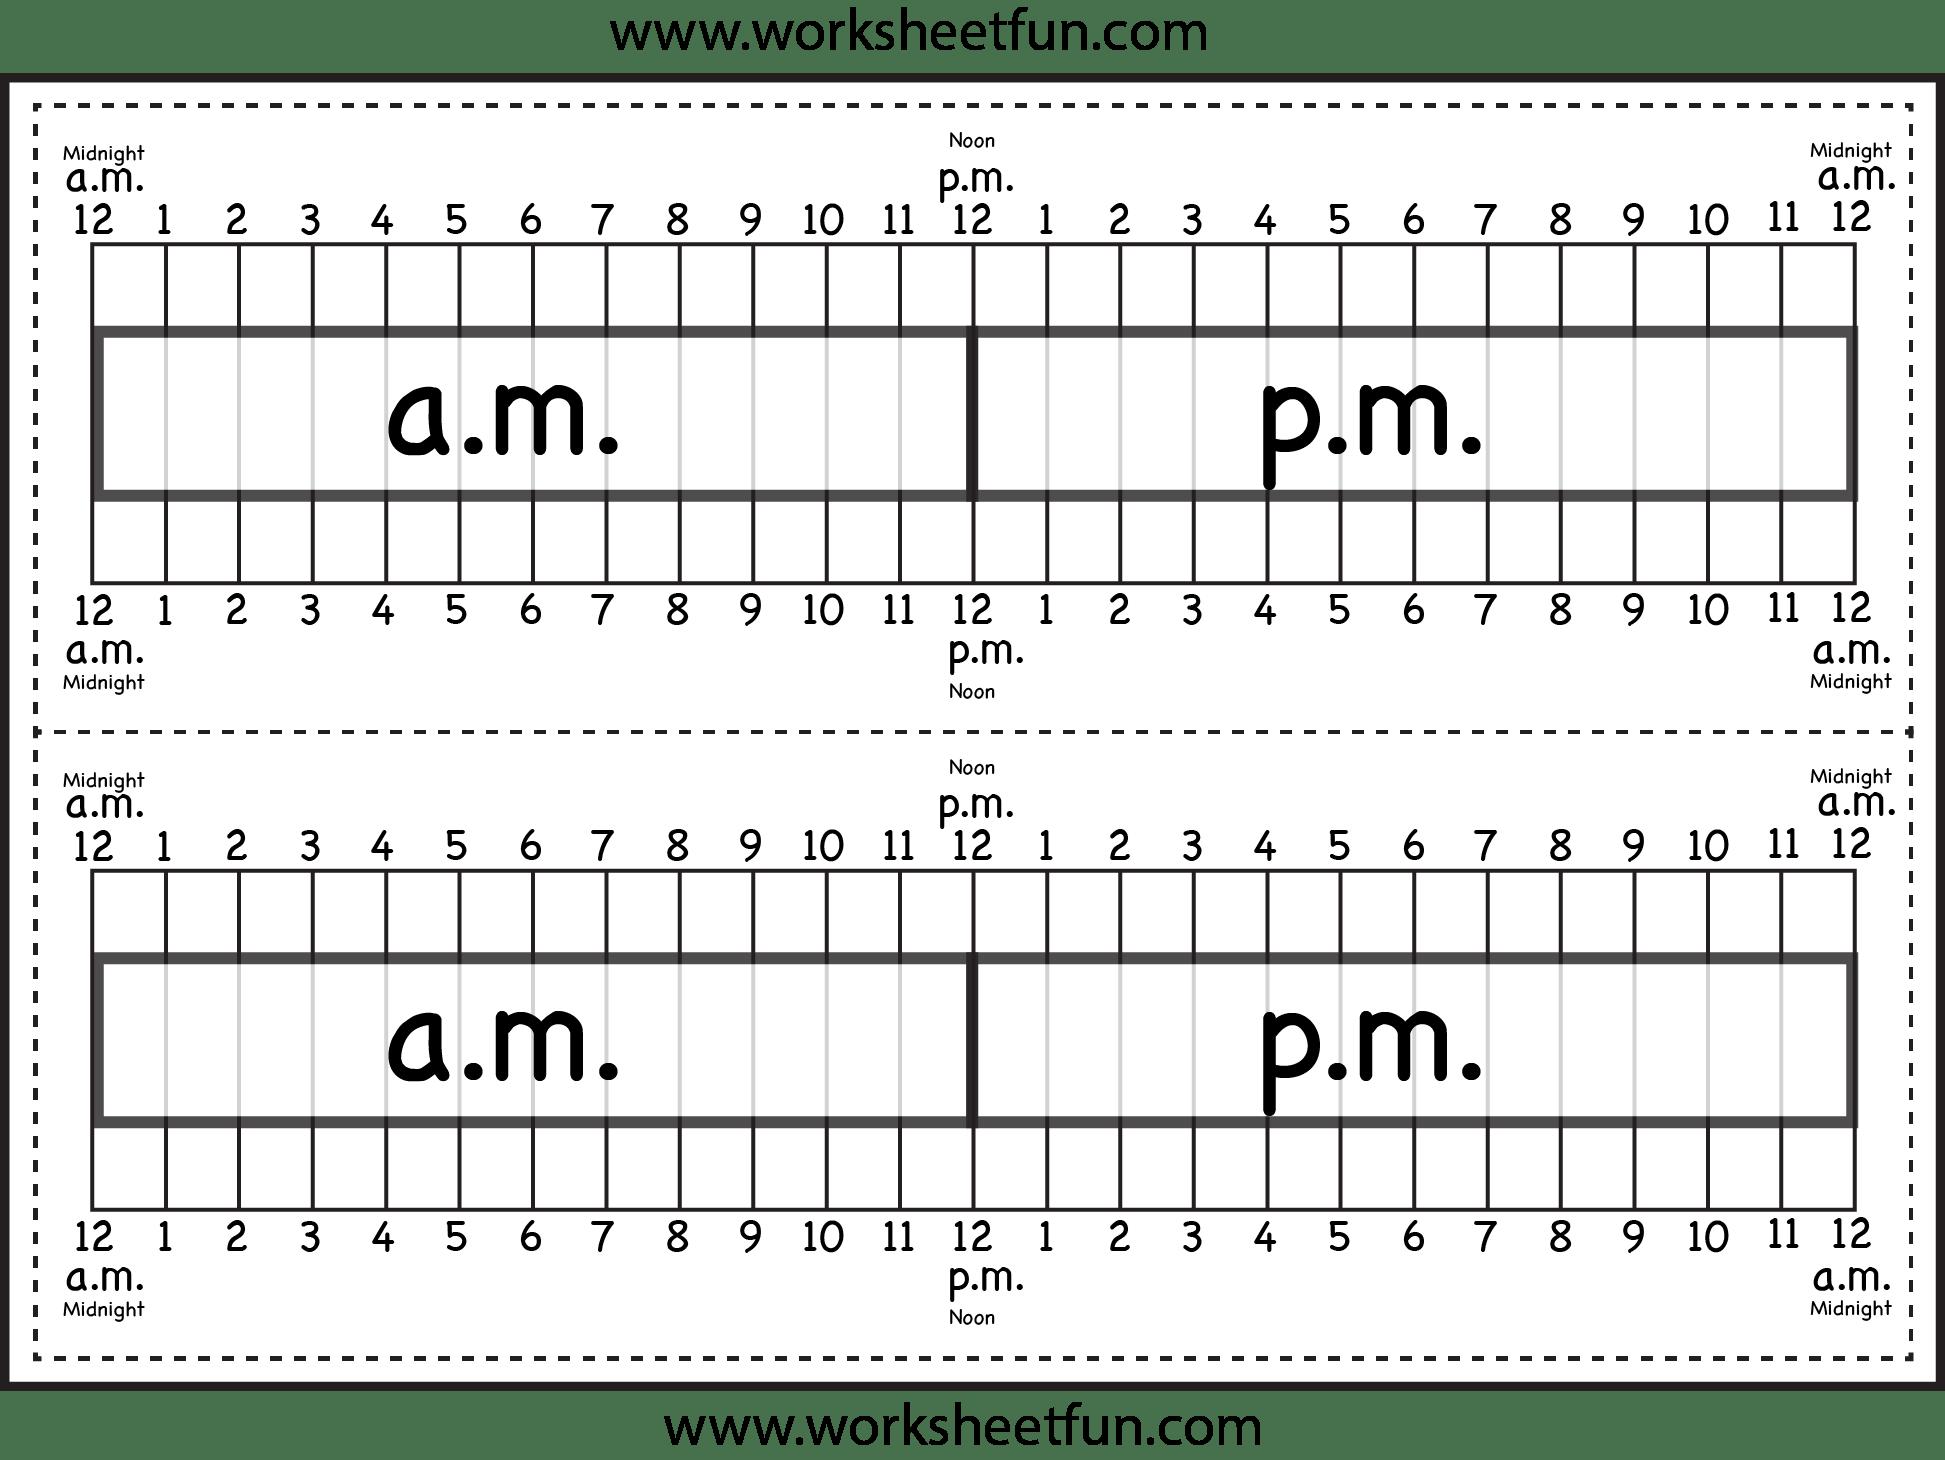 Elapsed Time Ruler Worksheet 2 Rulers On 1 Worksheet